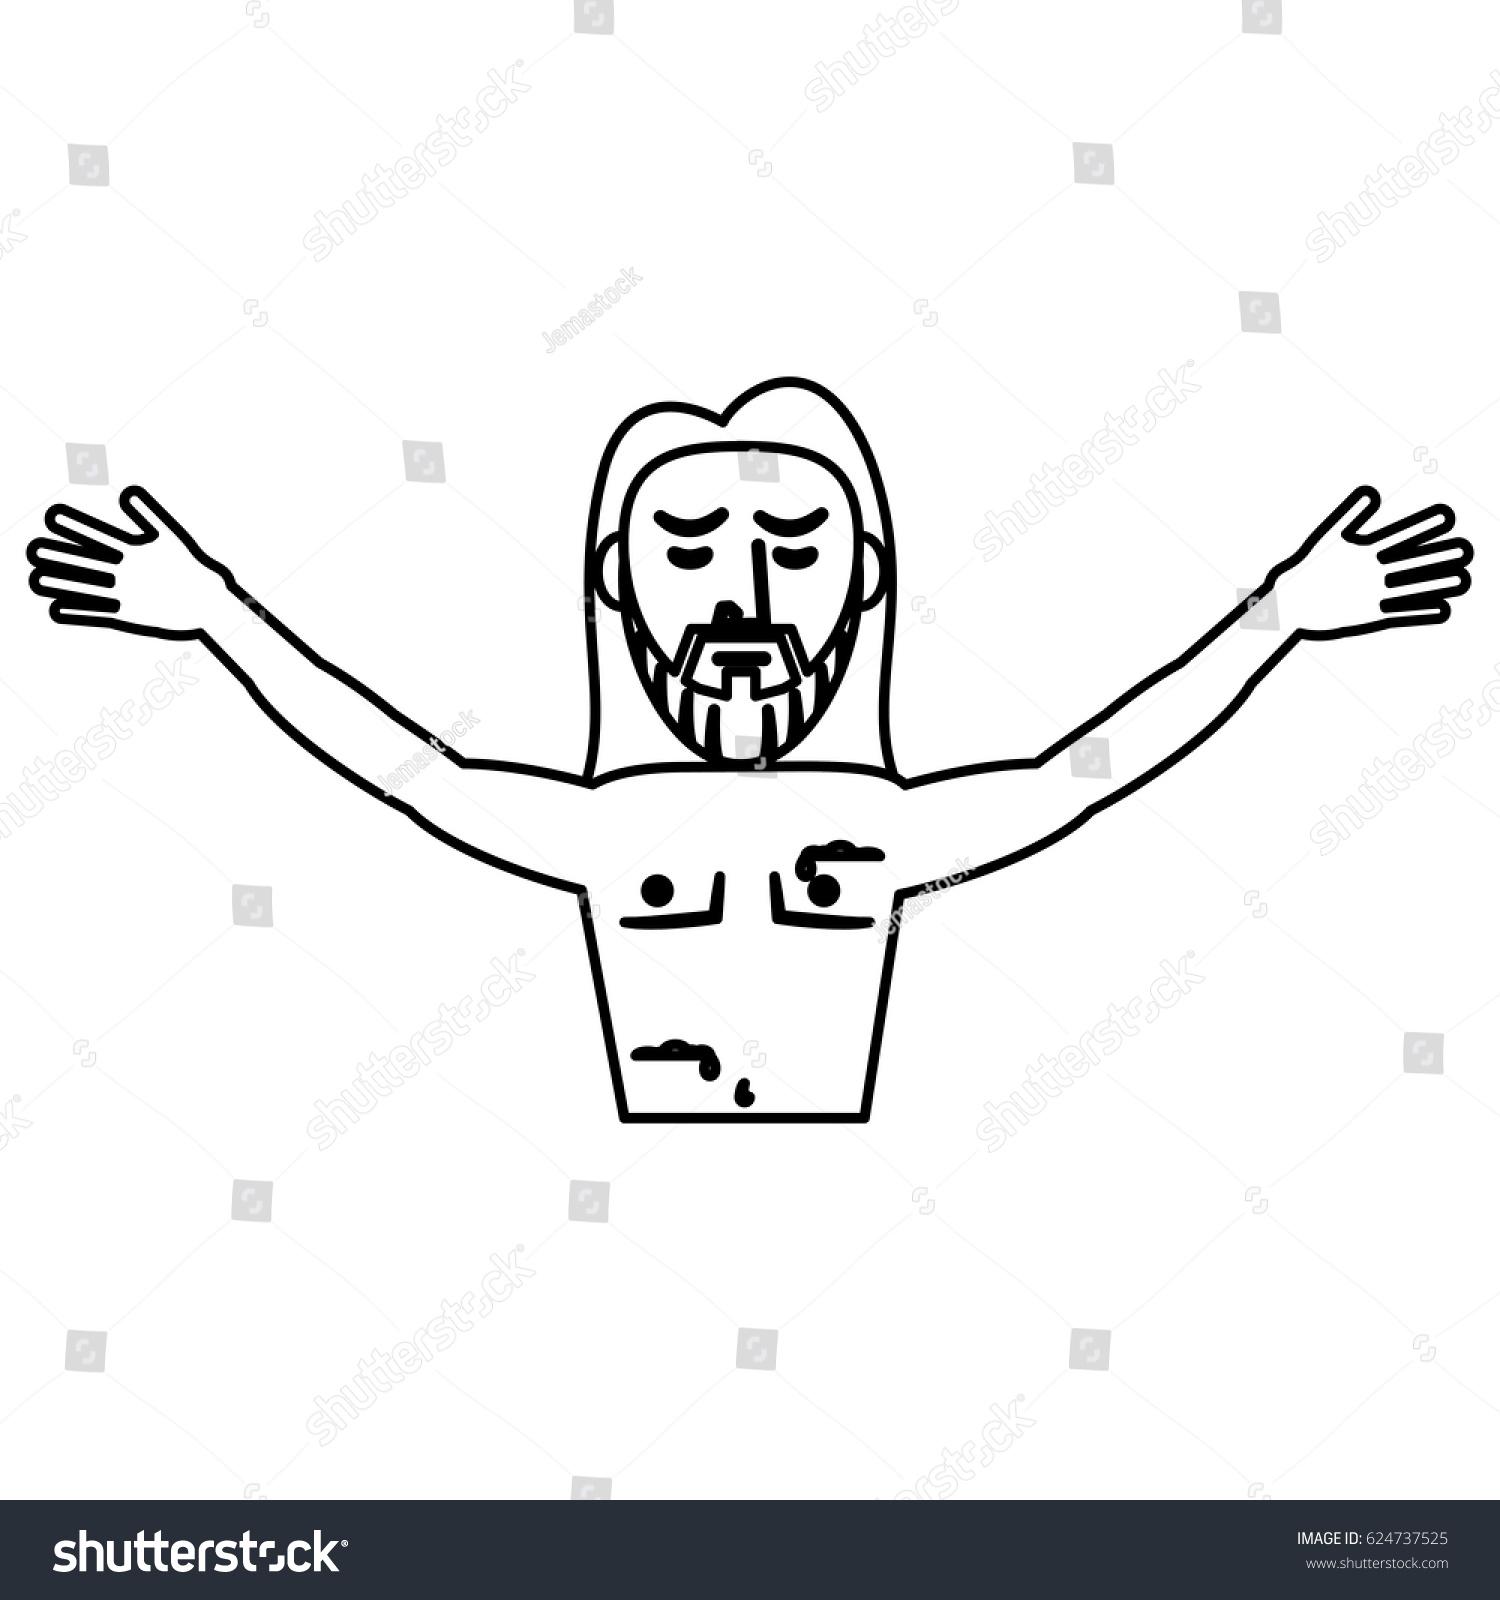 Jesus christ resurrection symbol outline stock vector 624737525 jesus christ resurrection symbol outline buycottarizona Image collections